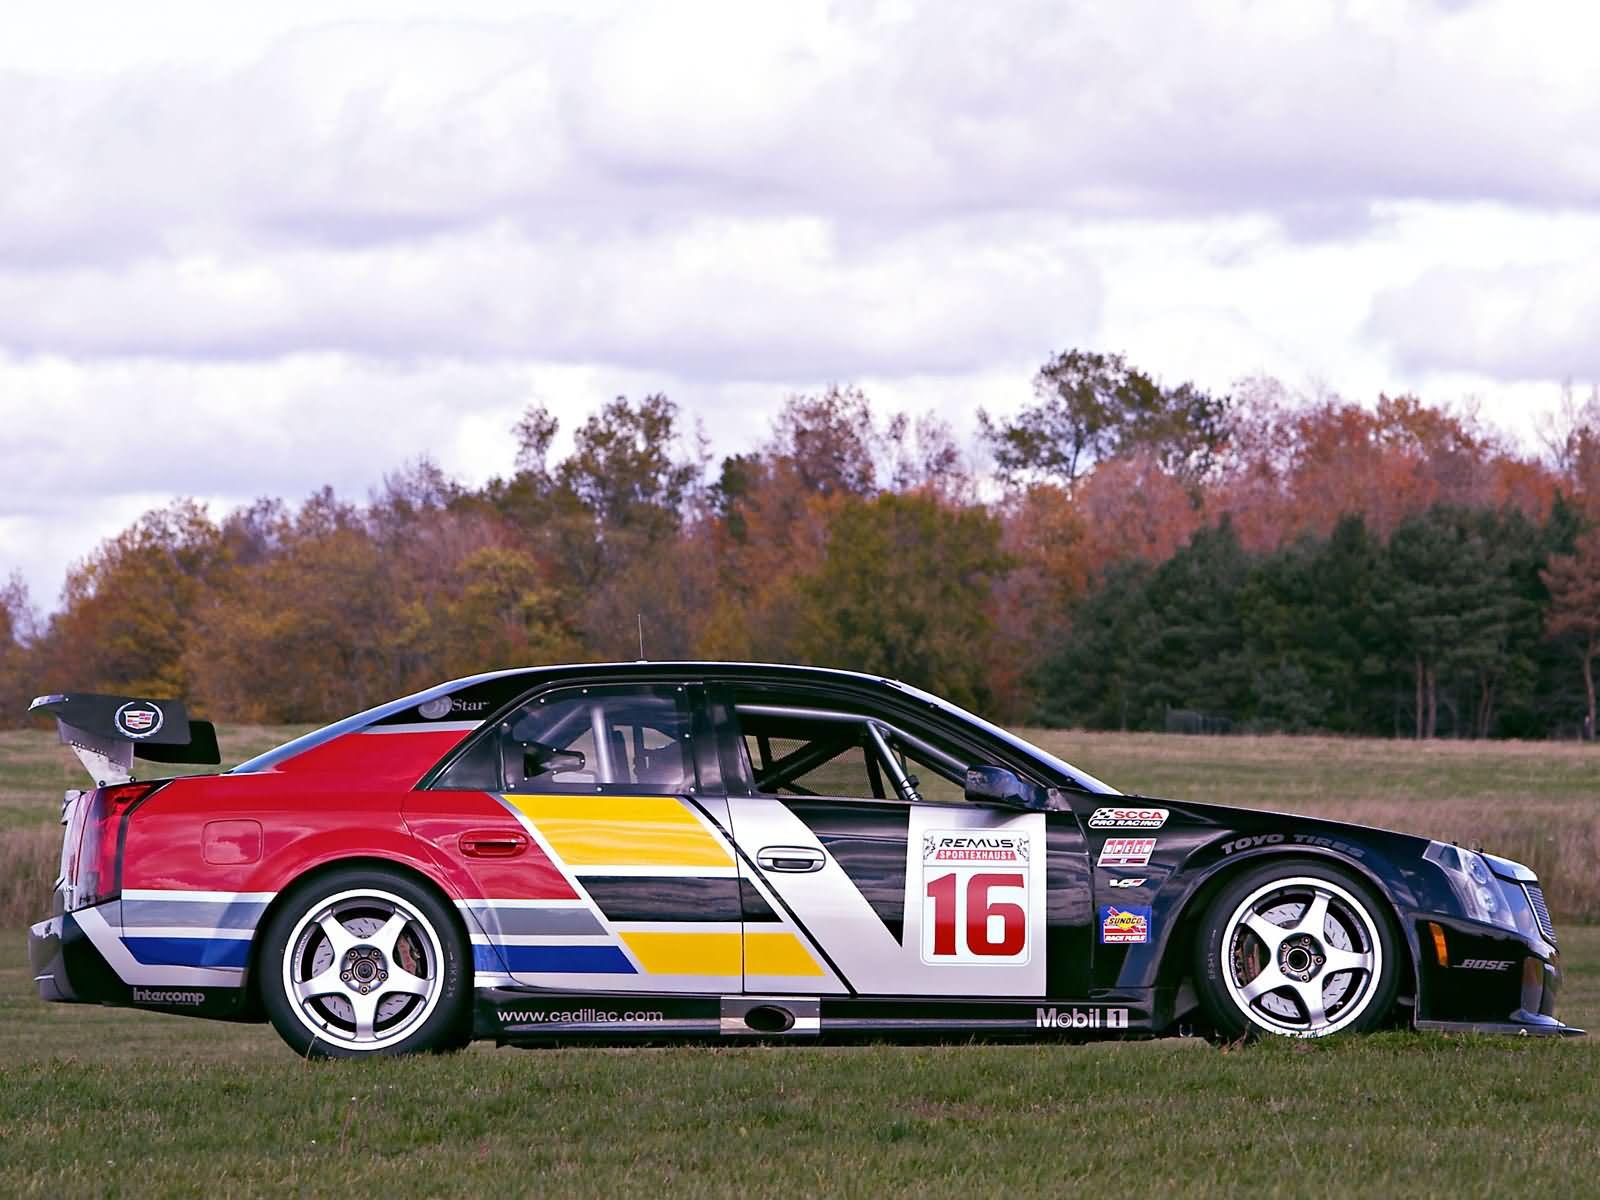 race car cadillac com ctsv information pictures specs